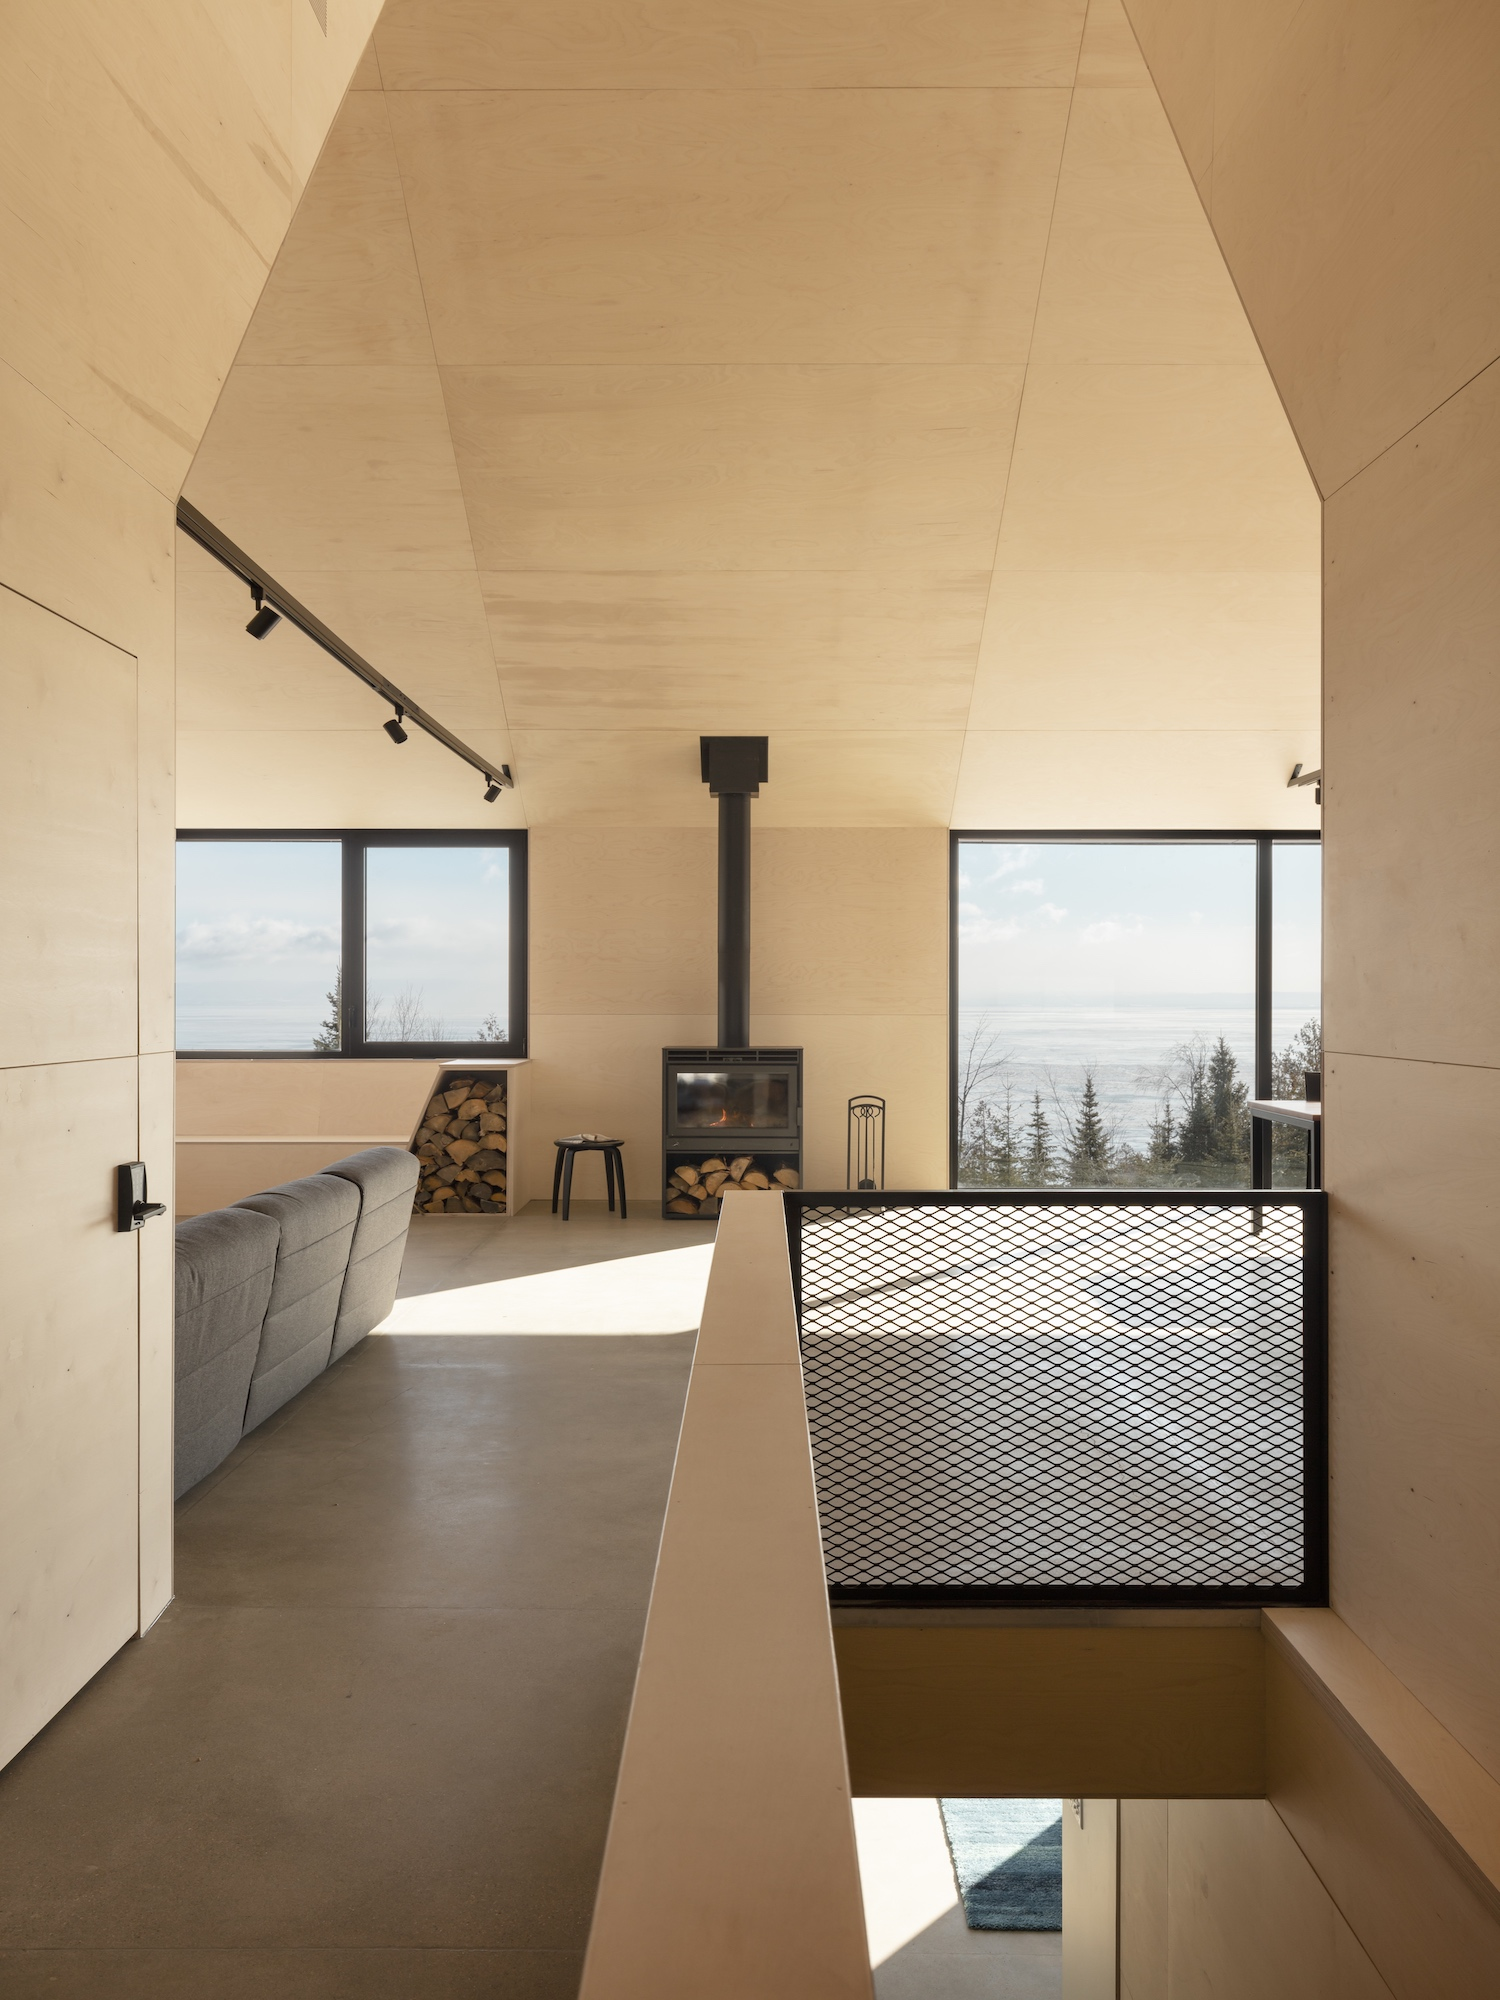 est living bourgeois lechasseur architects cabin a 02